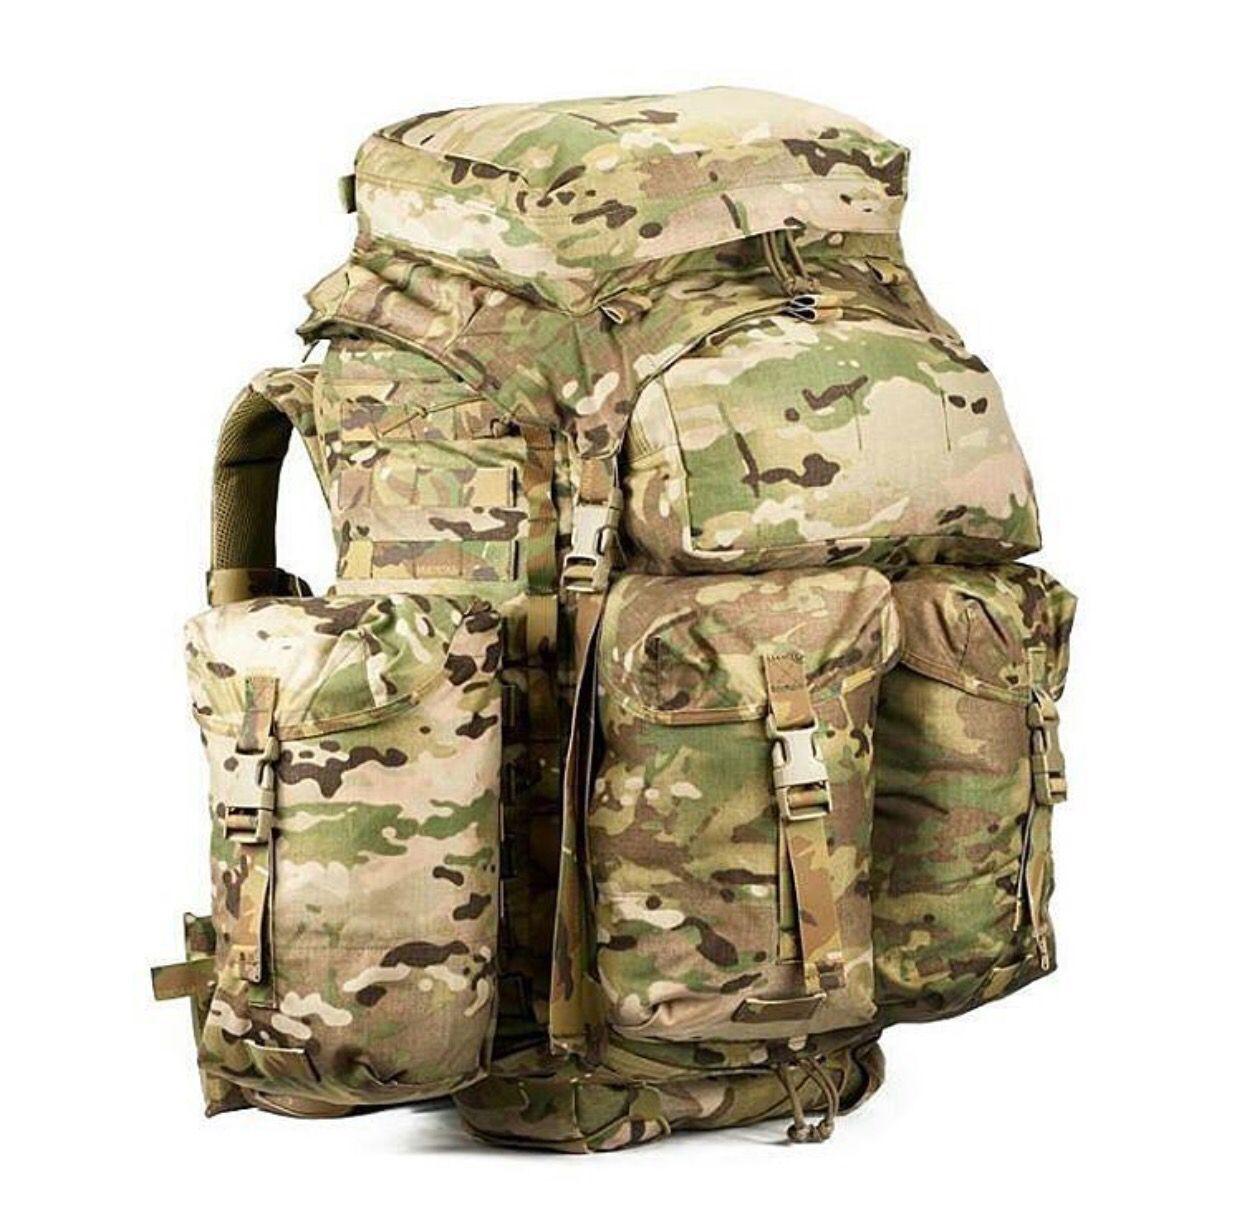 Platatac Sr Jungle Alice Pack Tactical Gear Combat Gear Survival Backpack